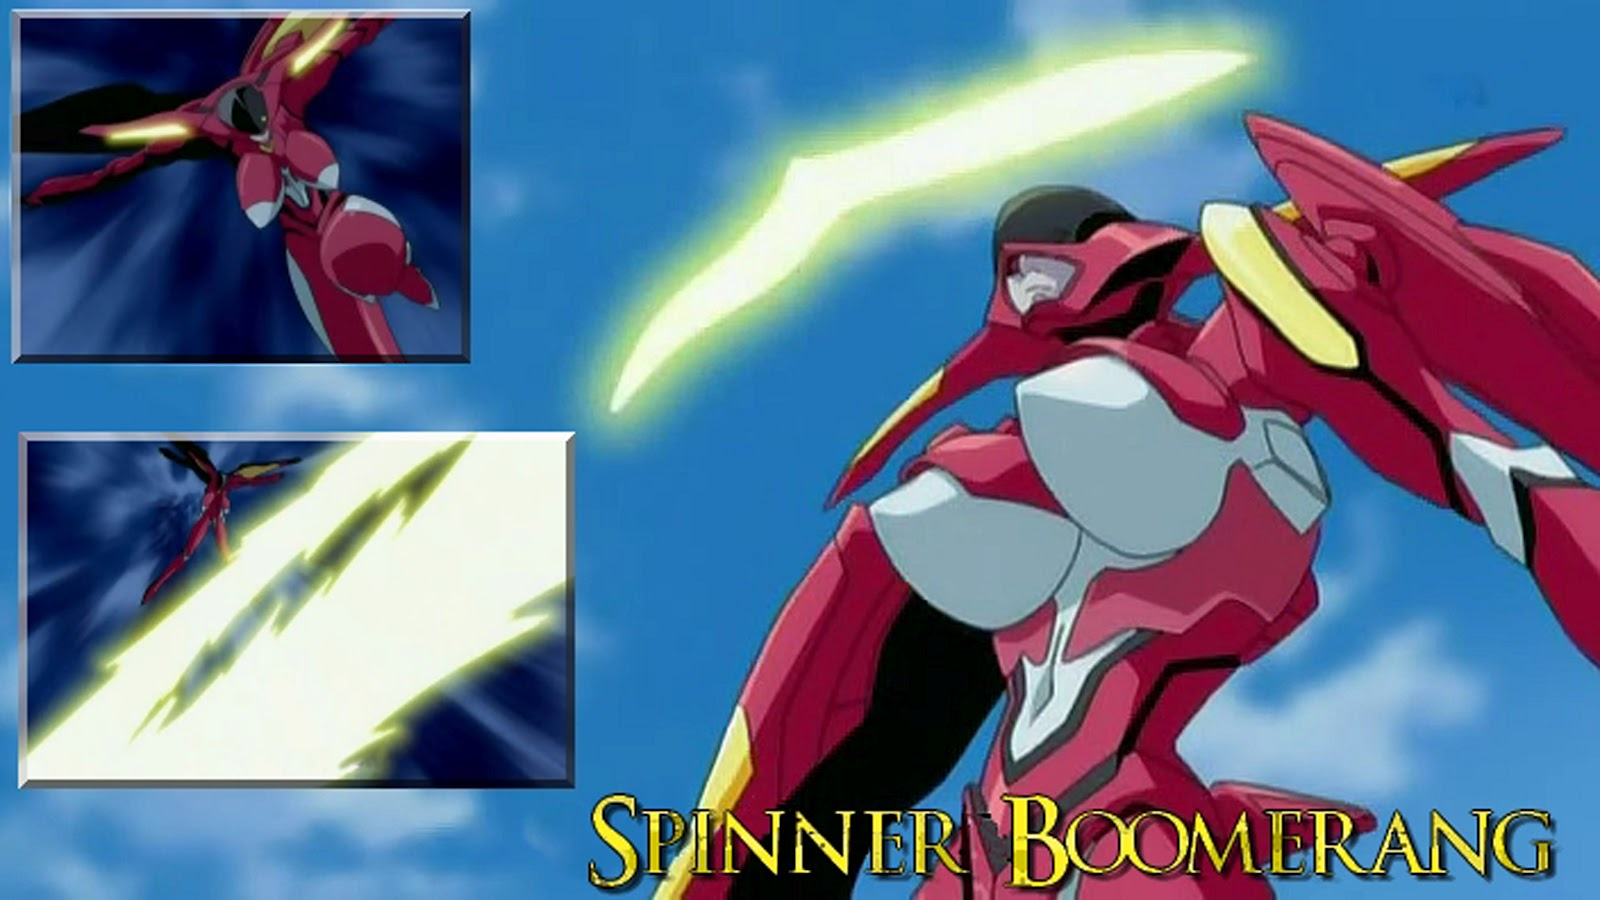 http://3.bp.blogspot.com/-pjmhjqGw7Lw/T9mCX_JtZ6I/AAAAAAAAGD0/wg8IfUe0czQ/s1600/godannar+volspina+volspinna+female+giant+robot+mecha+pink+big+huge+boosb+breasts+anime+drawign+wallpaper+spinner+boomerang.jpg